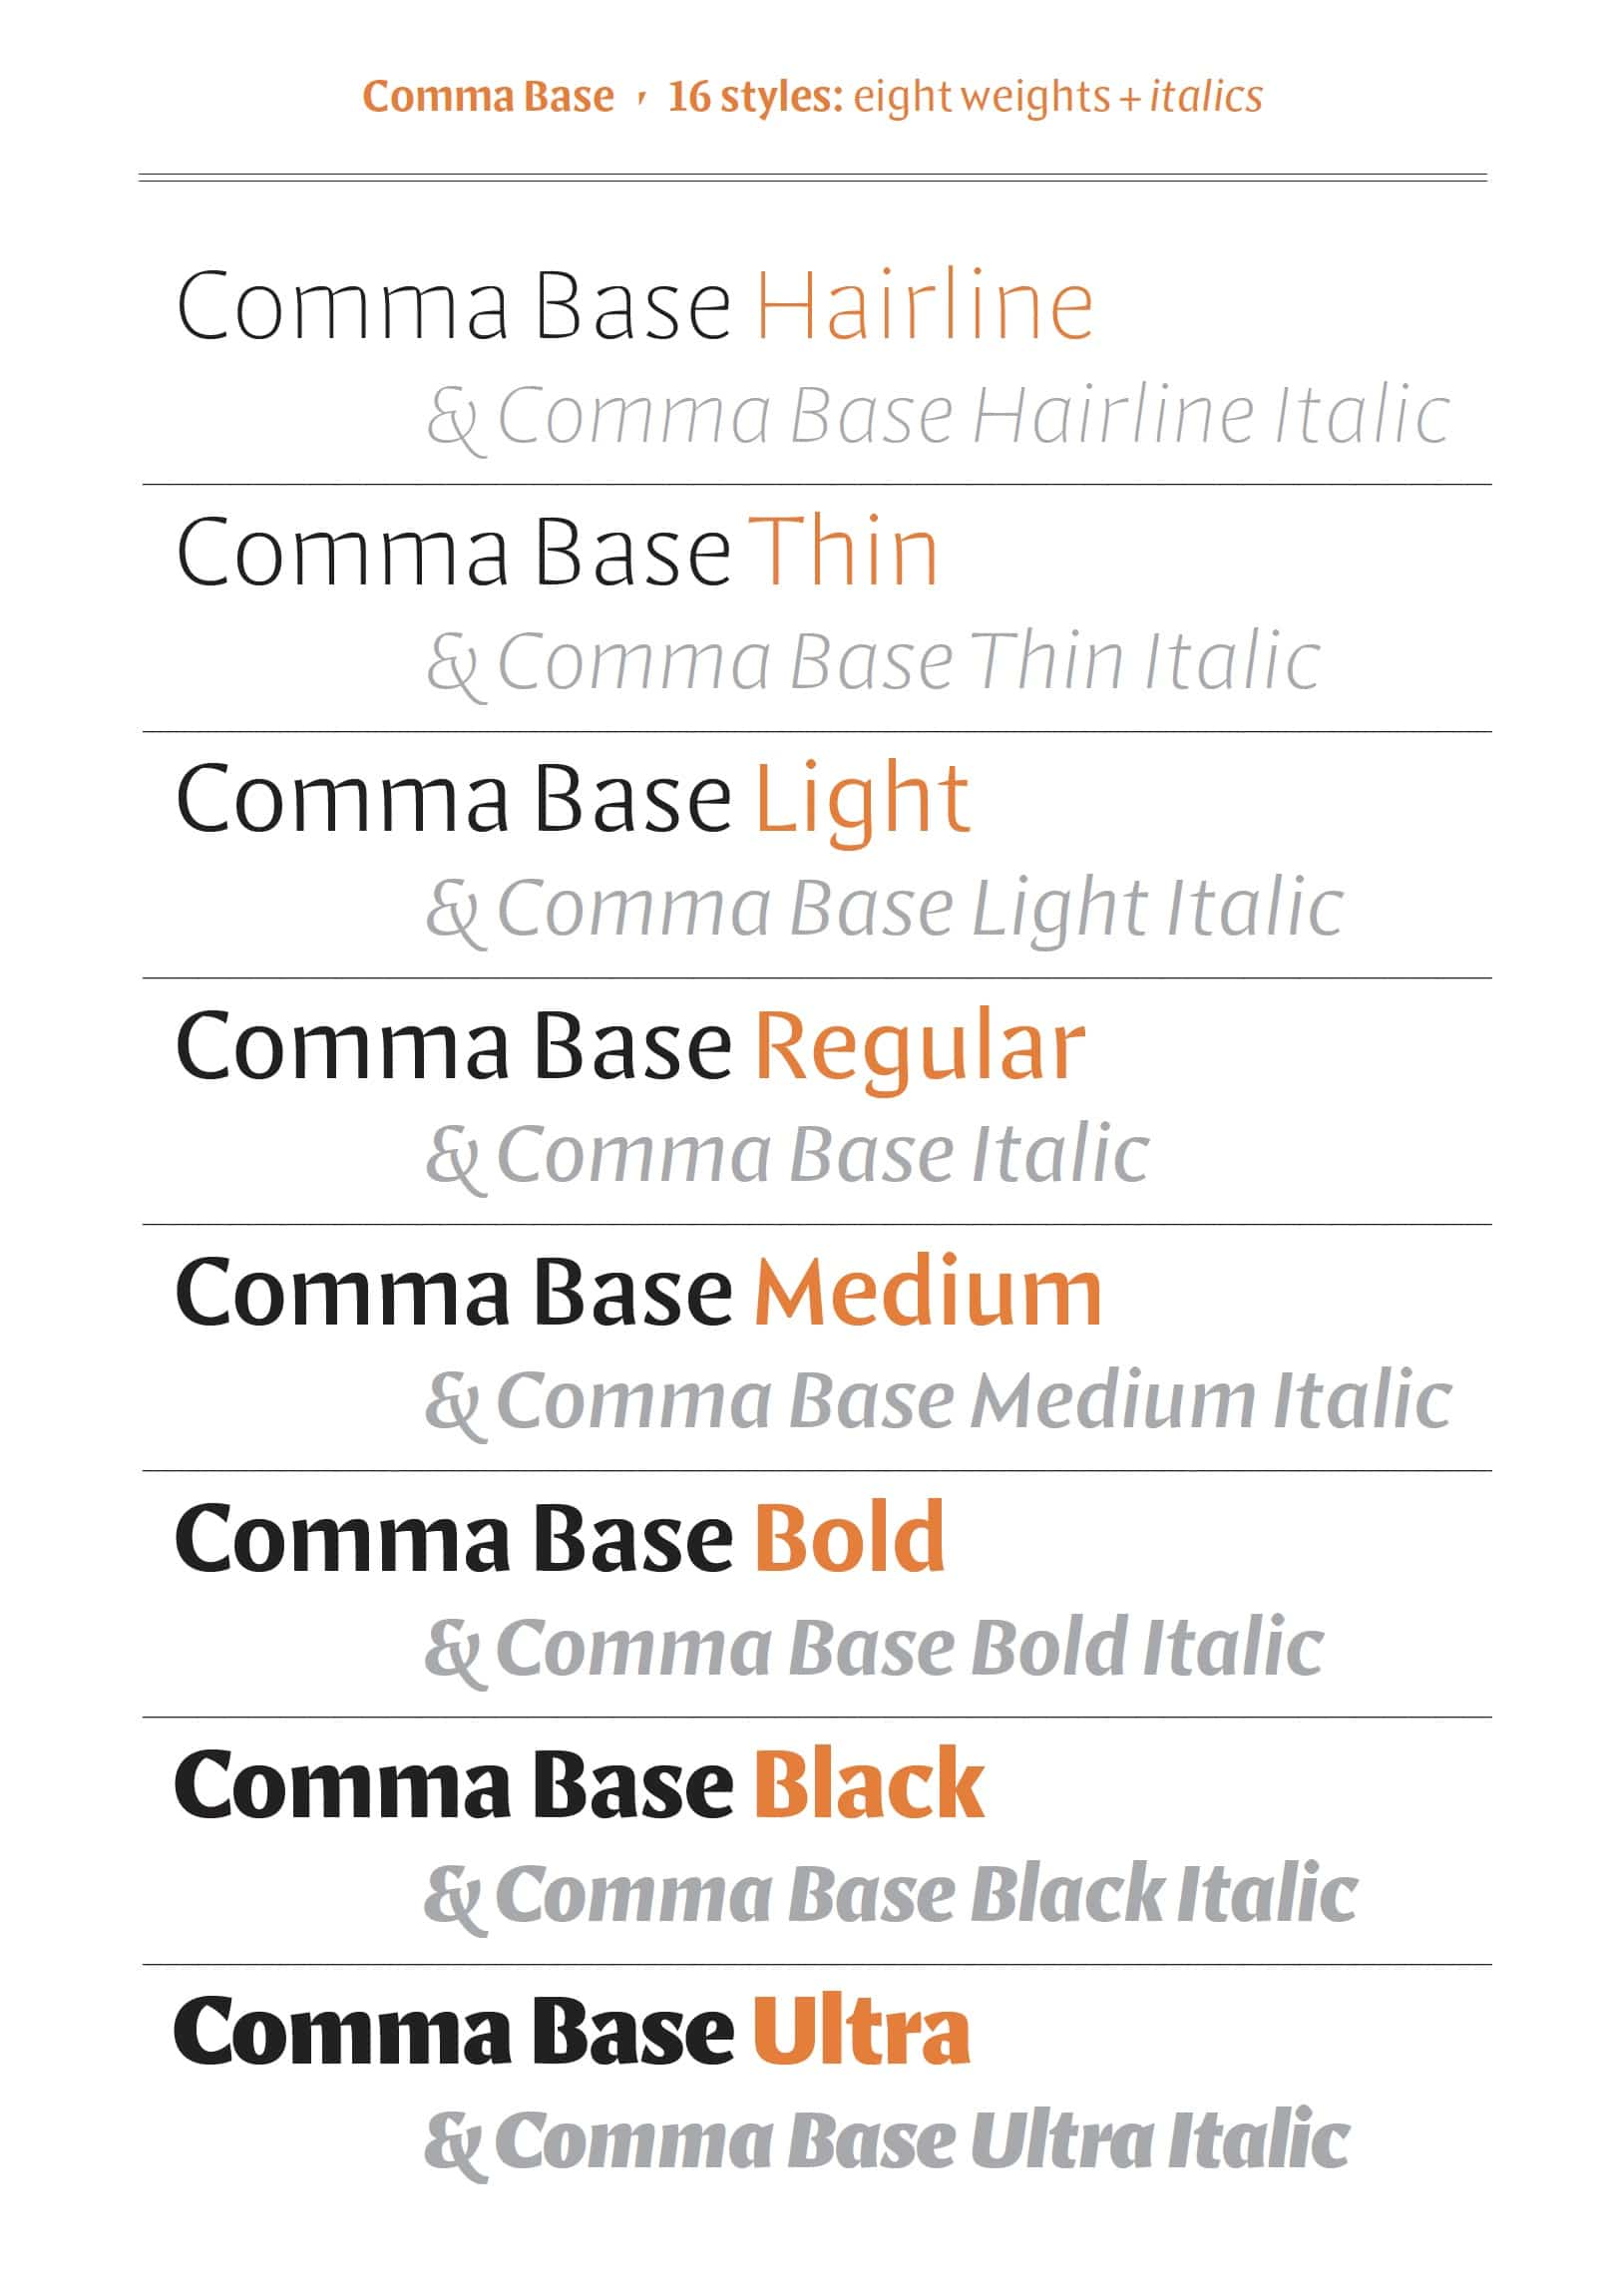 CommaBaseSchnitte